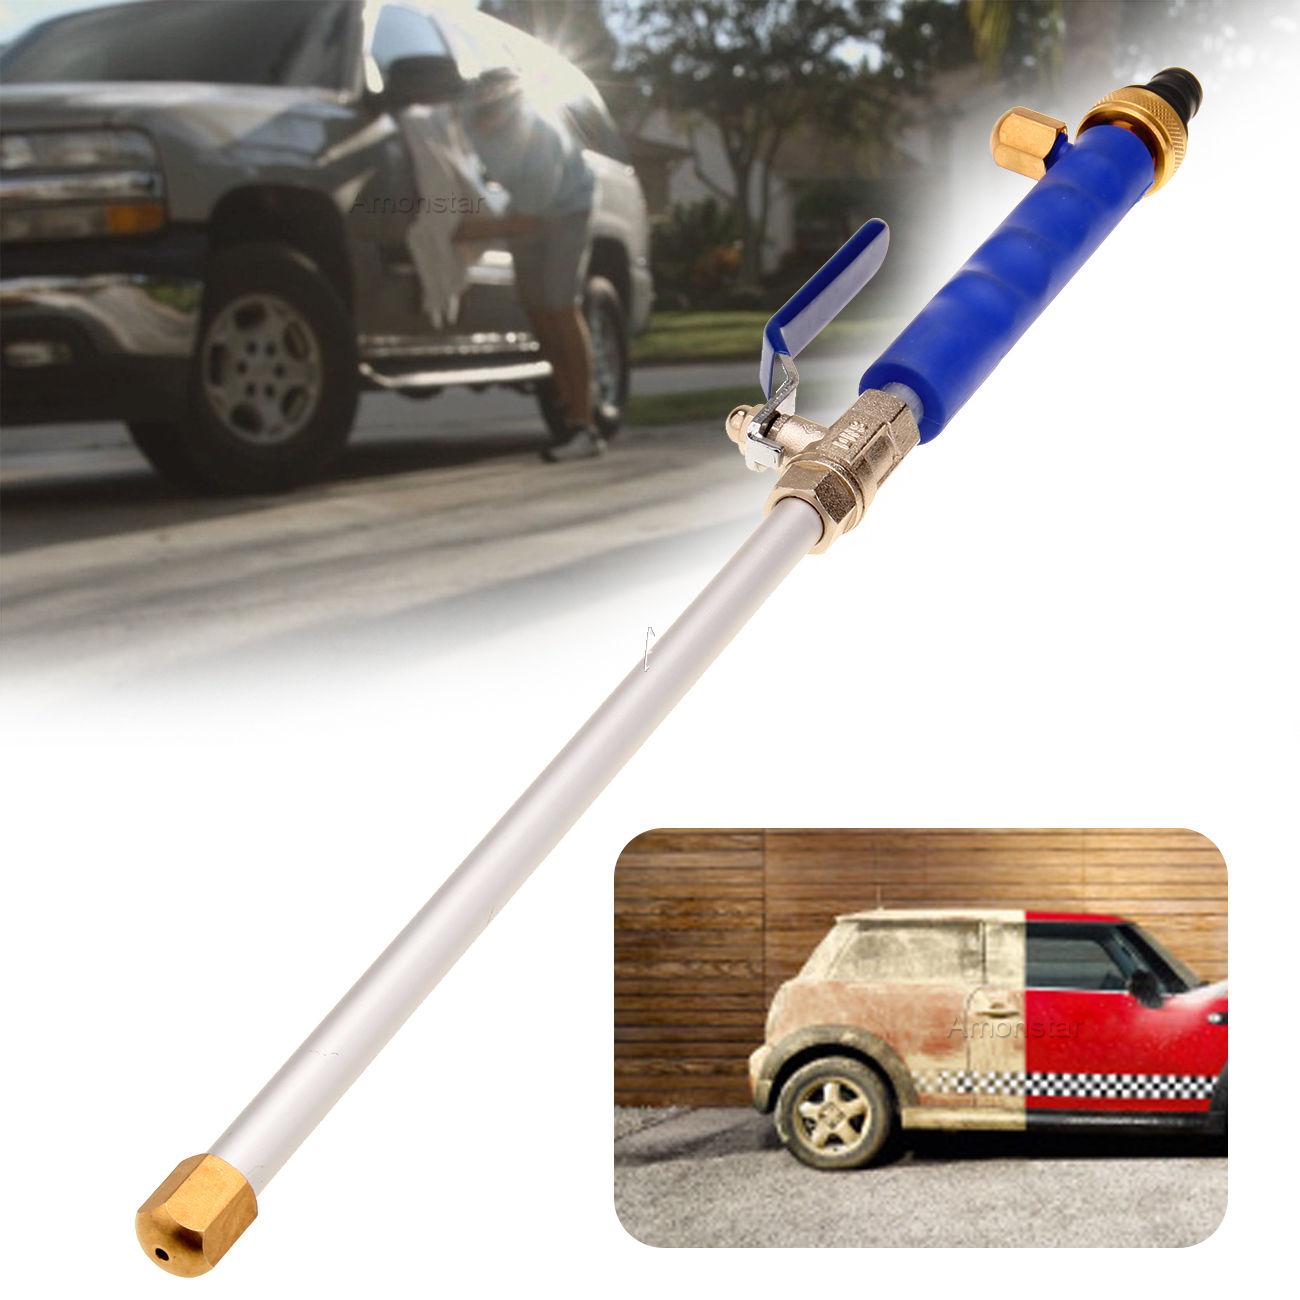 High Pressure Car Power Washer Spray Nozzle Water Hose Wand Attachment Garden